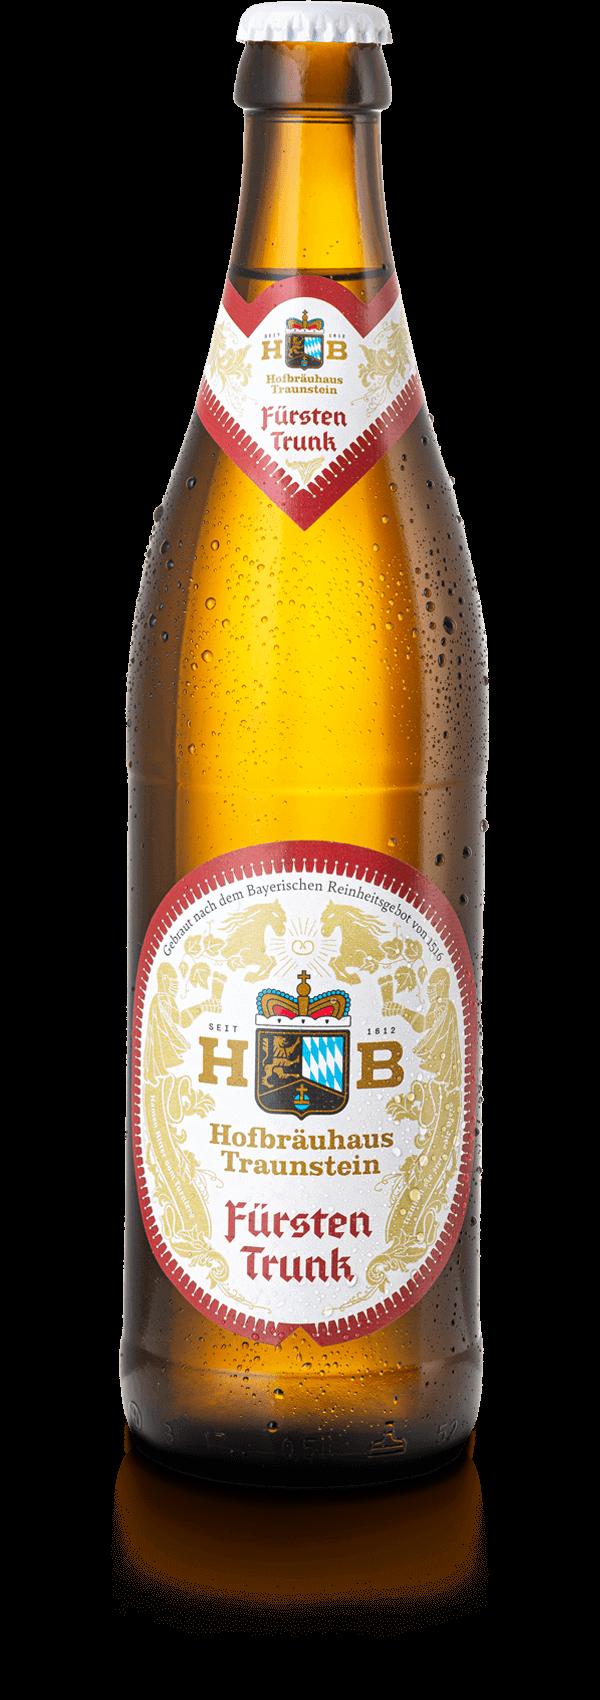 hb-ts-fuerstendrunk